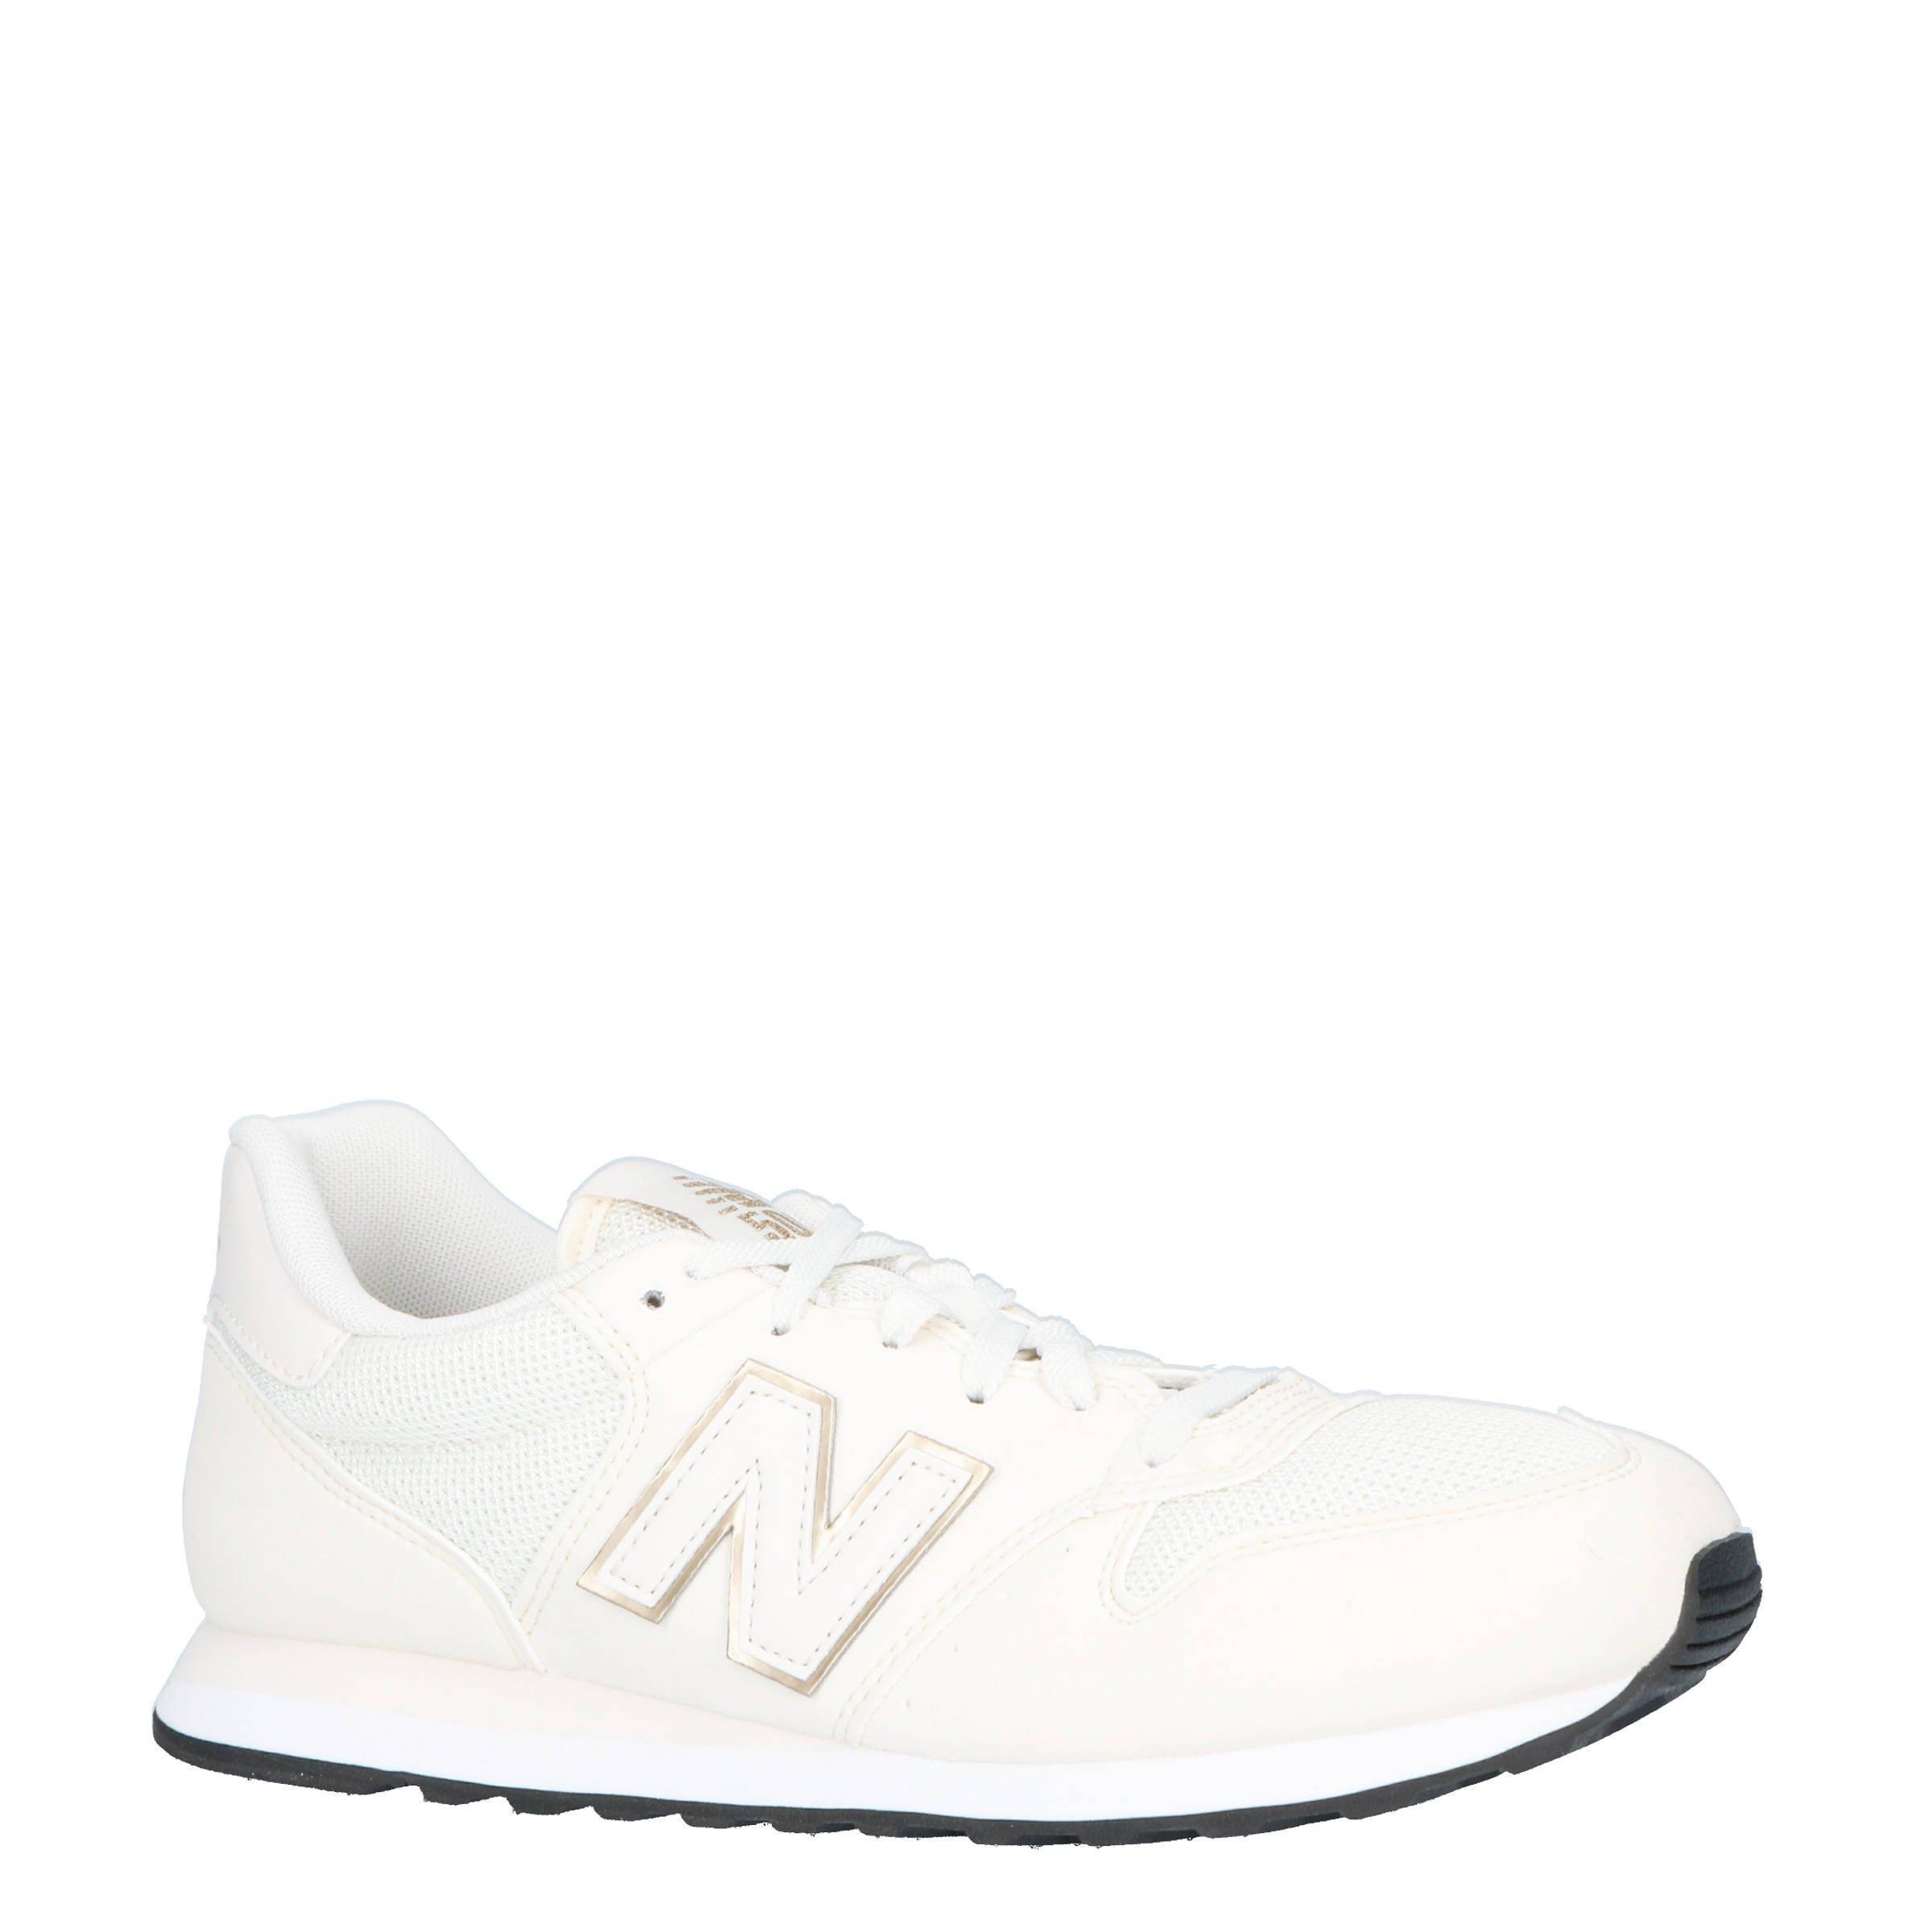 New Balance GW 500 sneakers wit/goud | wehkamp